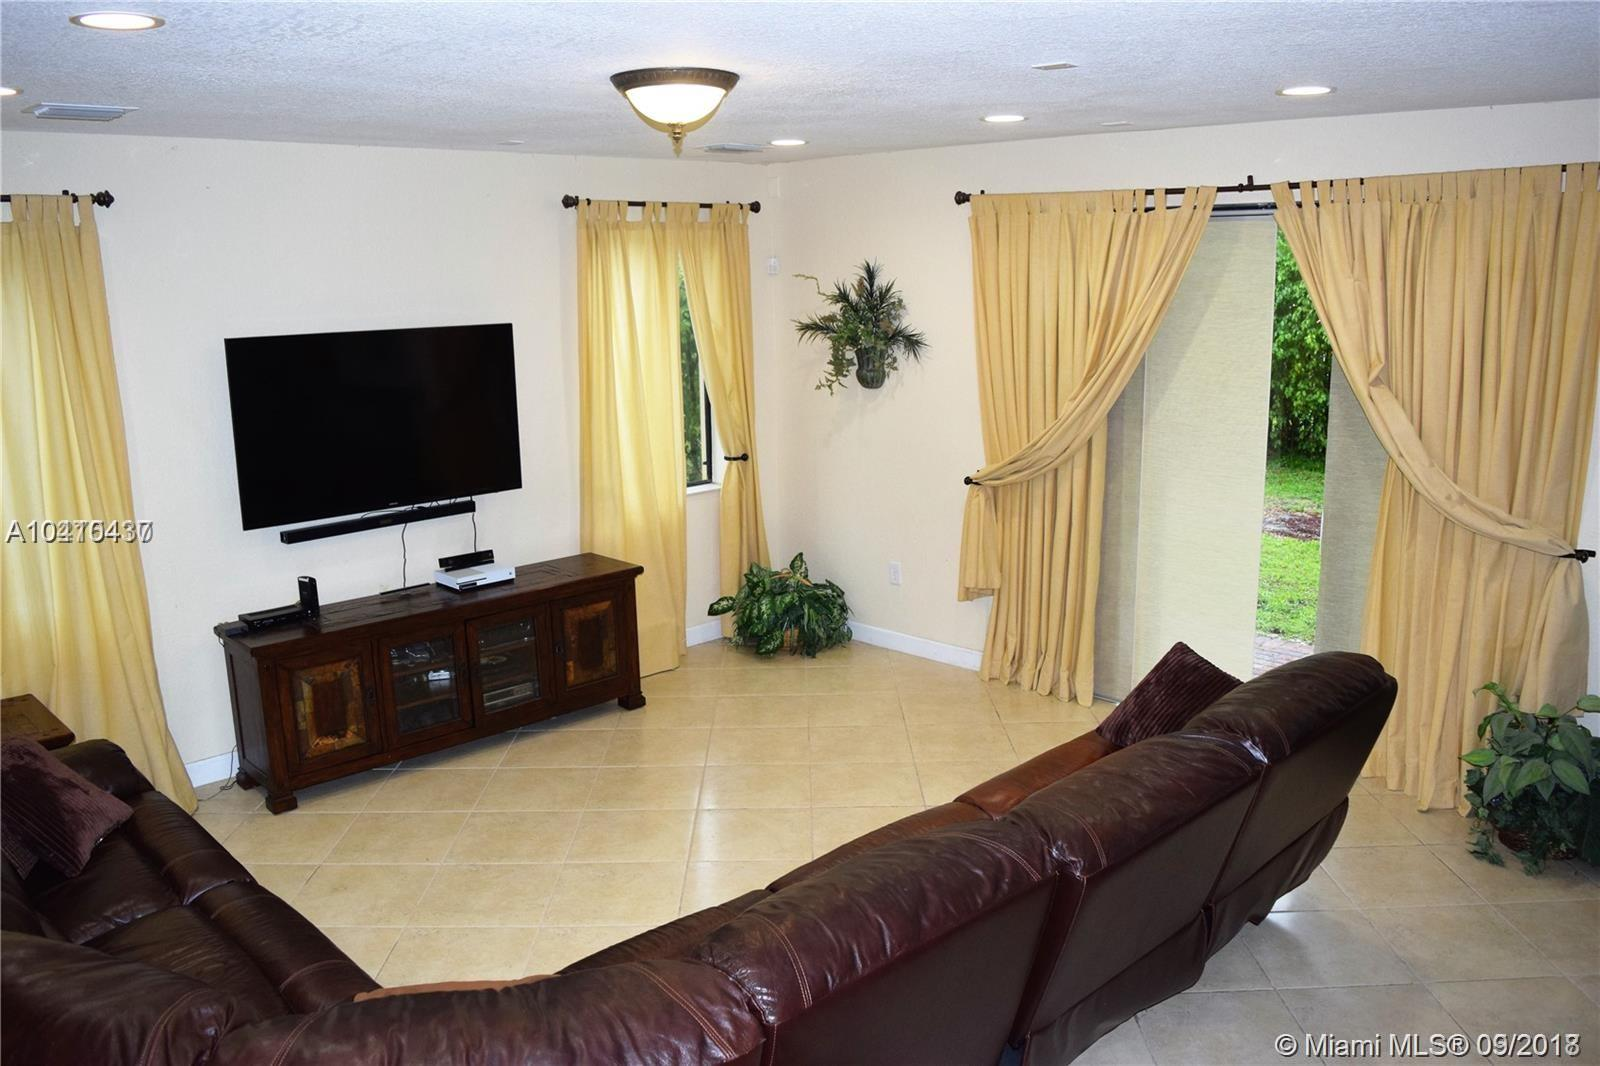 19030 Sw 74th Ave, Cutler Bay FL, 33157